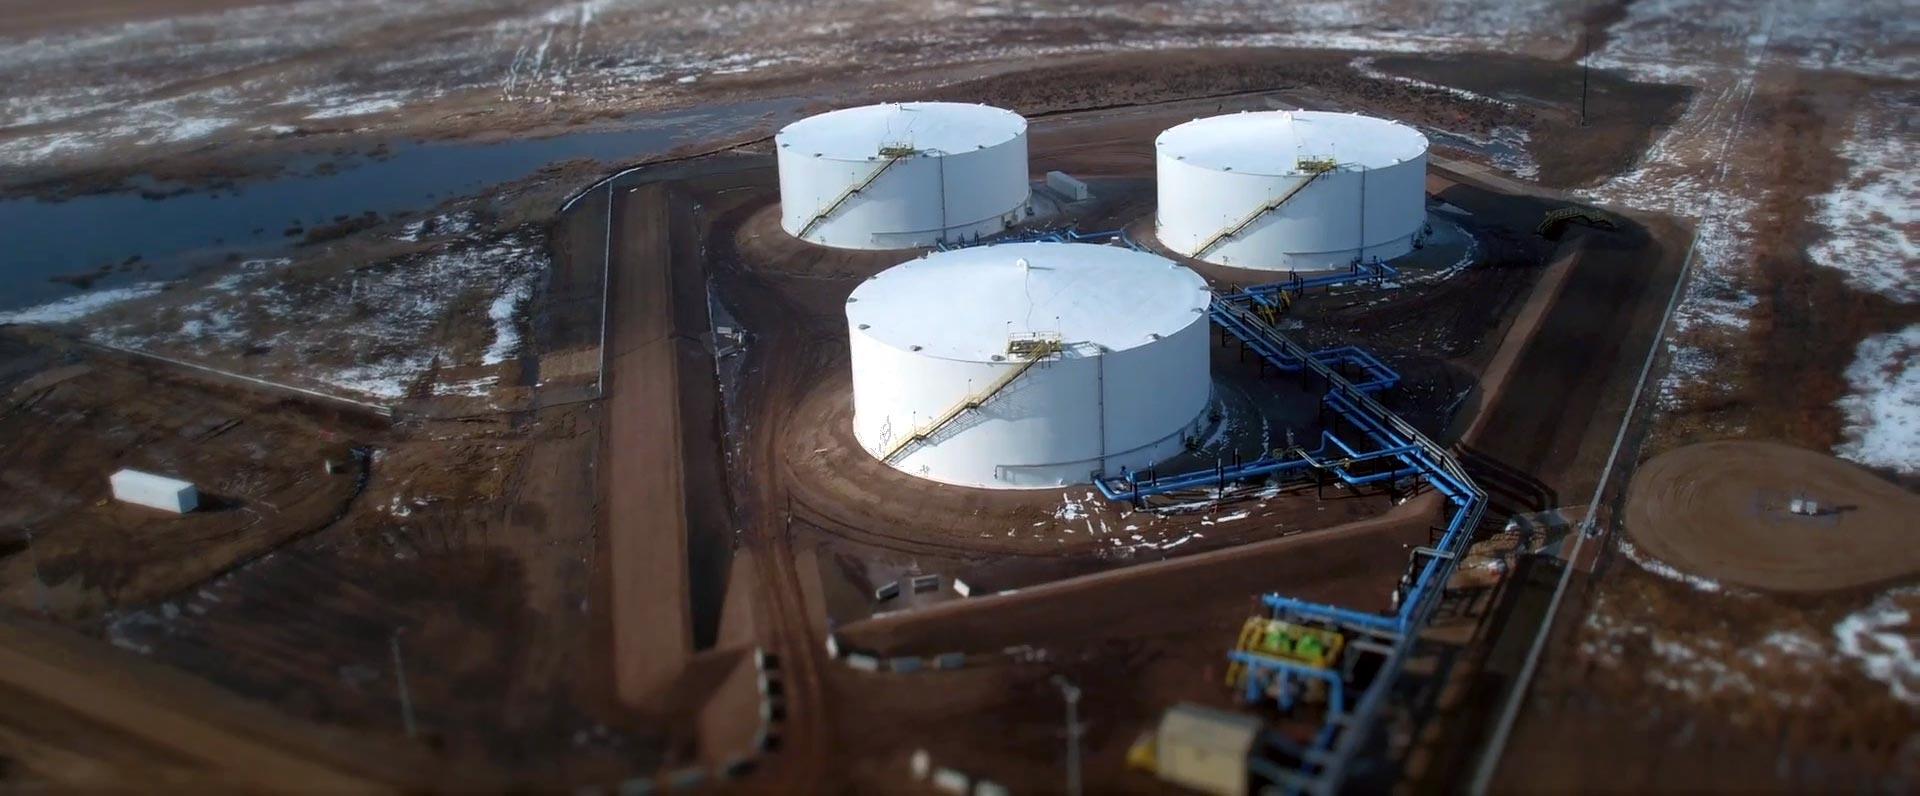 aerial-shot-epc-crude-oil-tanks